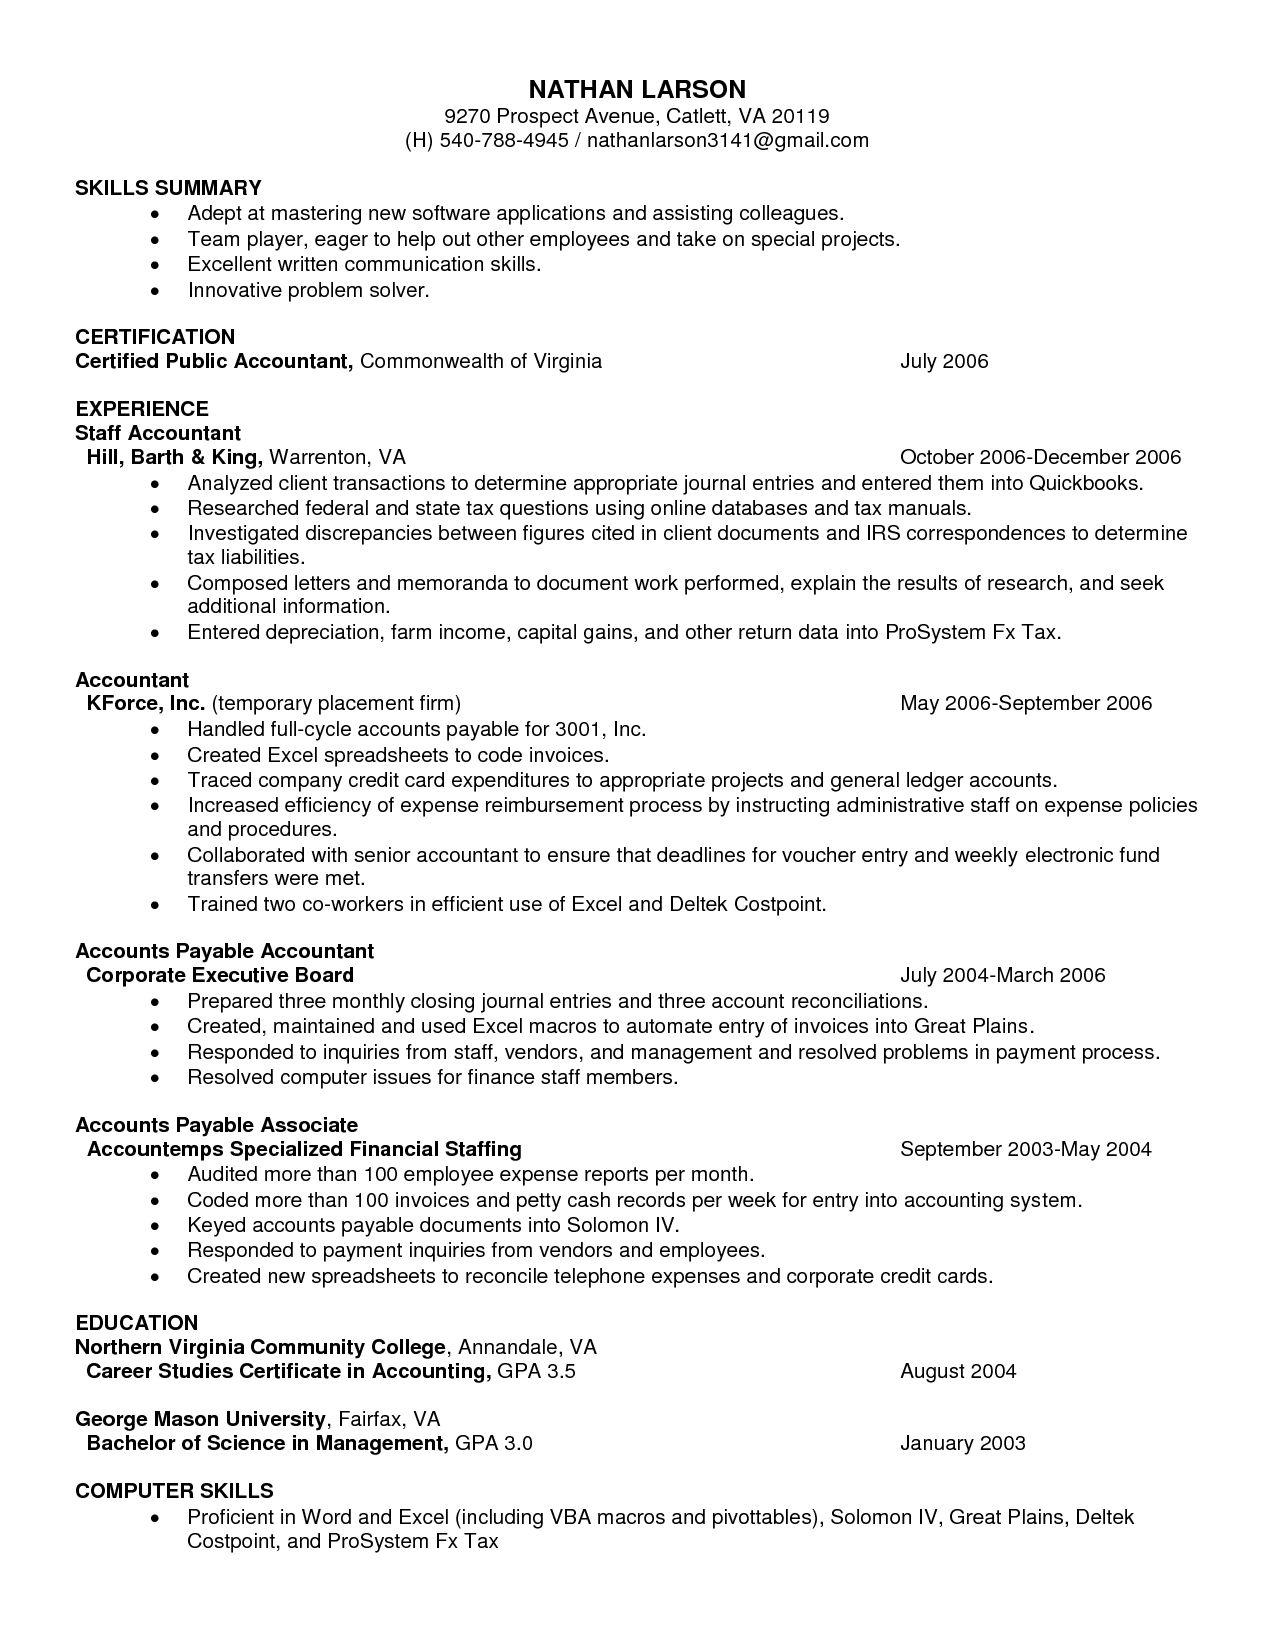 Open Office Spreadsheet Tutorial Pdf Best Resume Template Resume Templates Resume Format